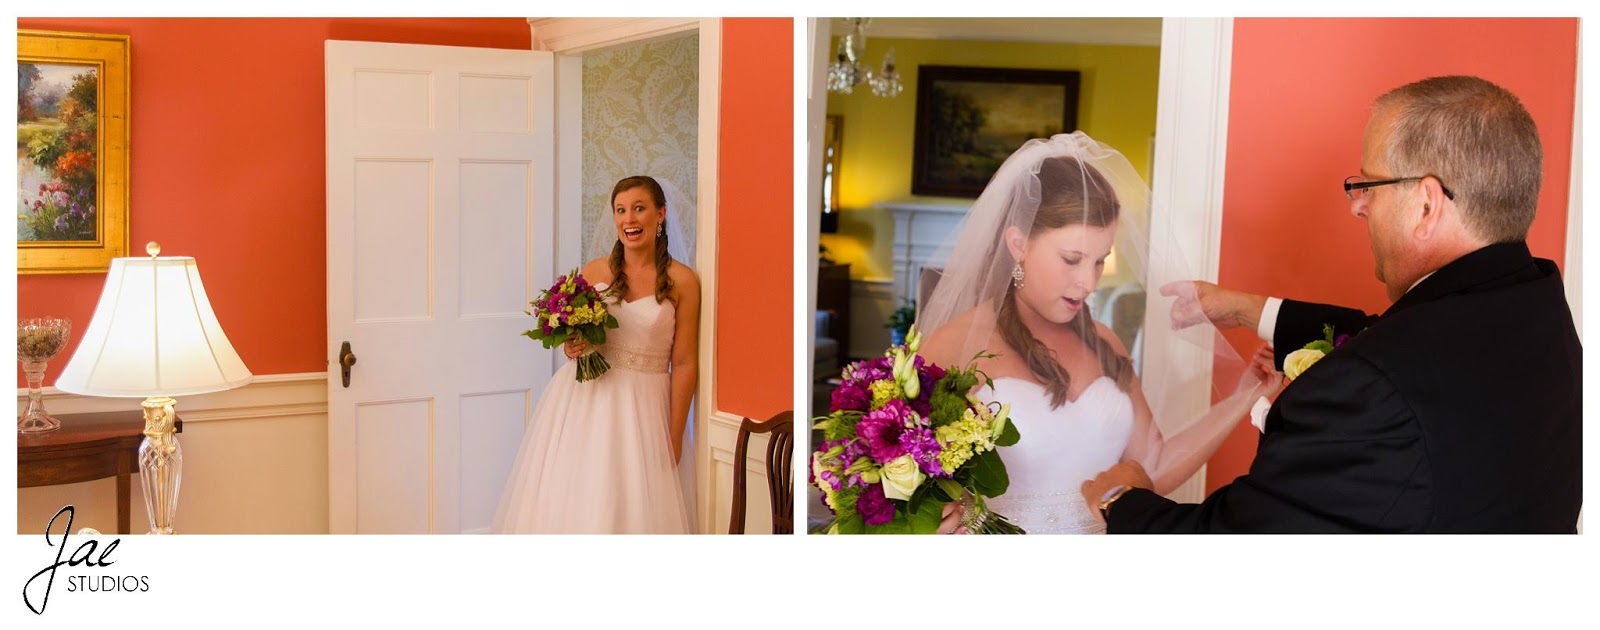 Jonathan and Julie, Bird cage, West Manor Estate, Wedding, Lynchburg, Virginia, Jae Studios, orange, inside, bride, father of the bride, veil, flowers, bouquet, lamp, wedding dress, getting ready